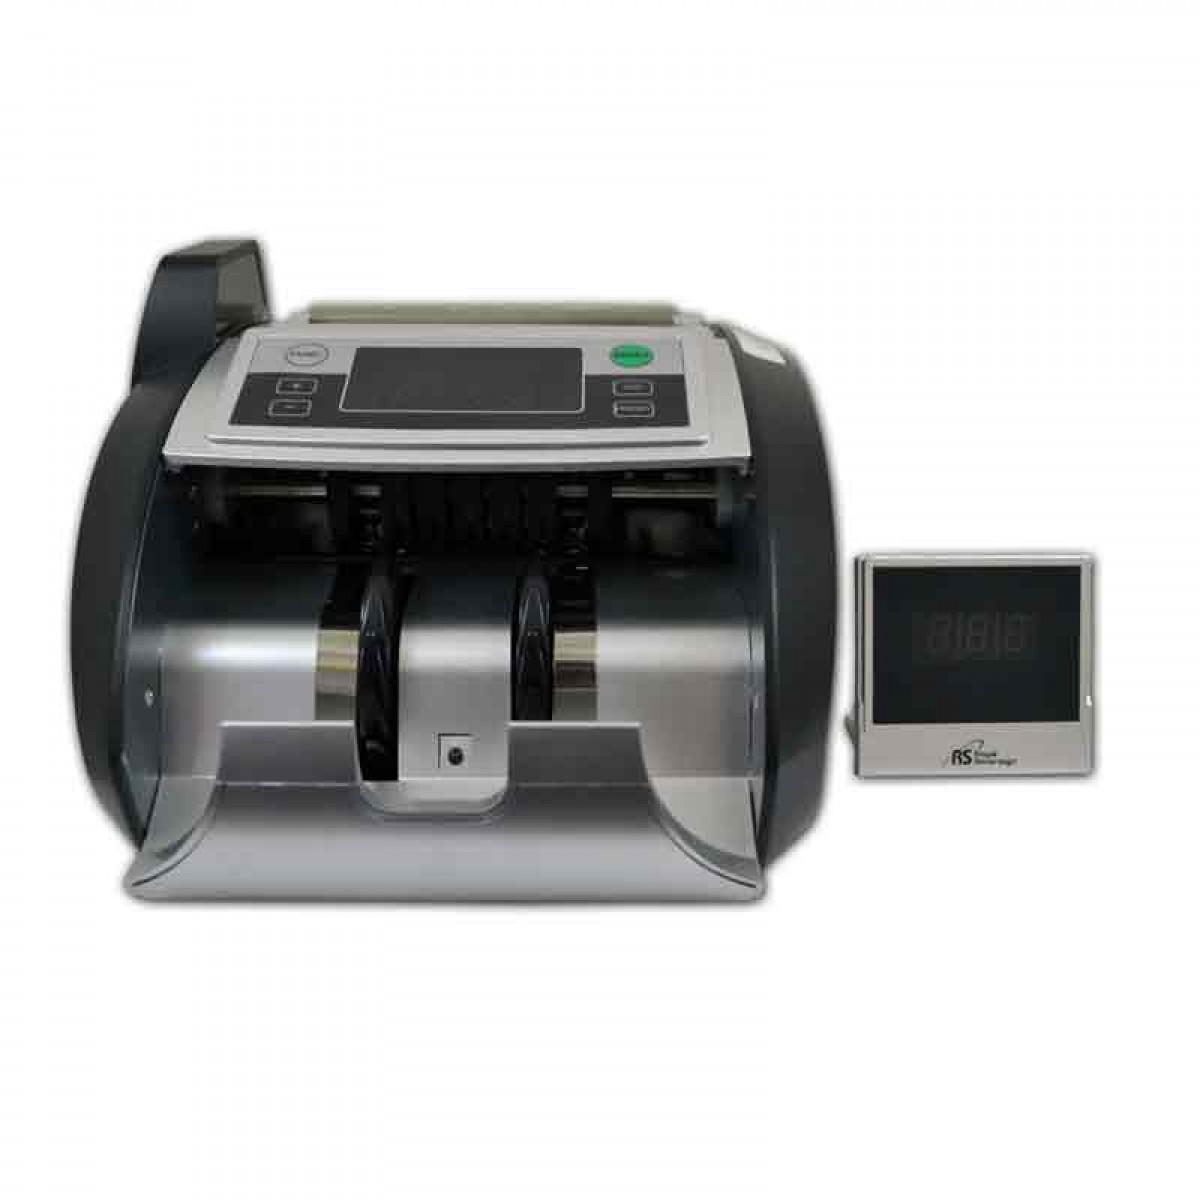 Royal Sovereign Counter External Display Rbc 100